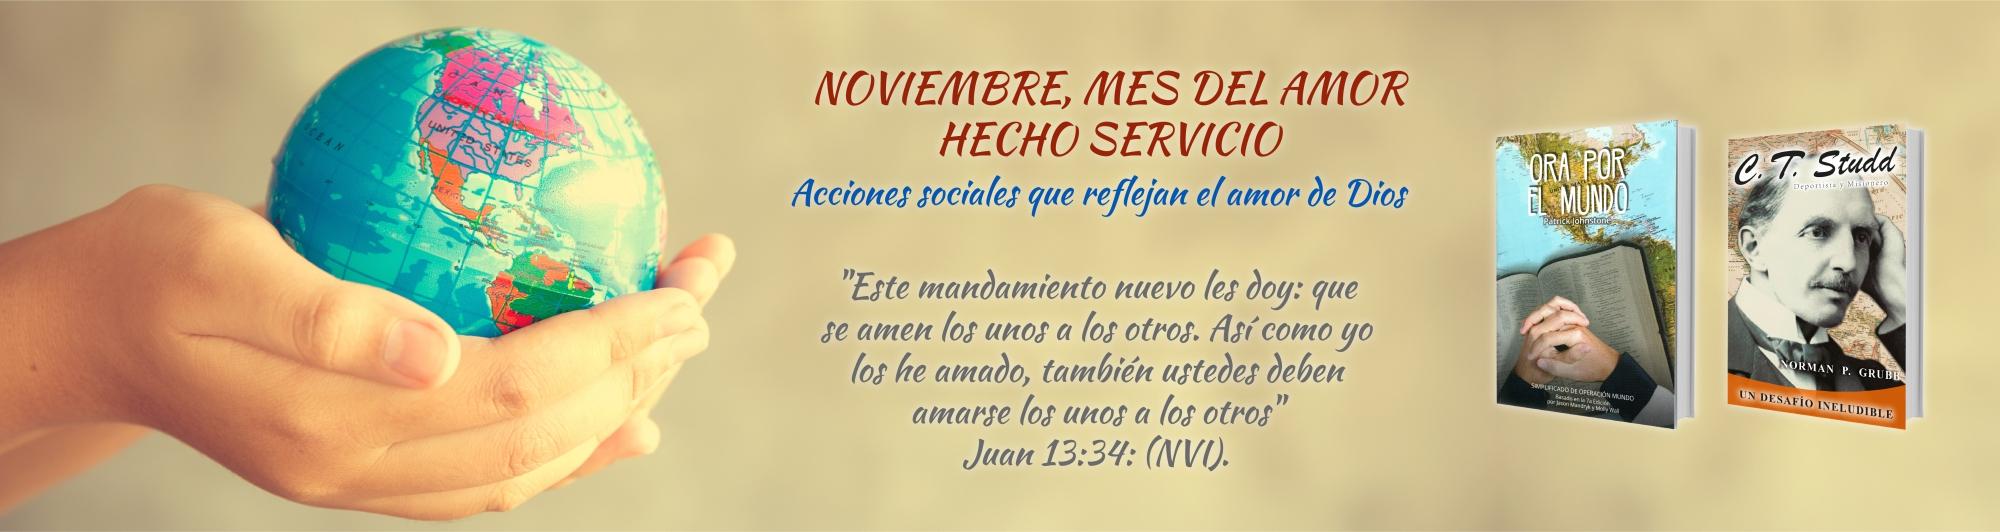 banner web noviembre 2019-01